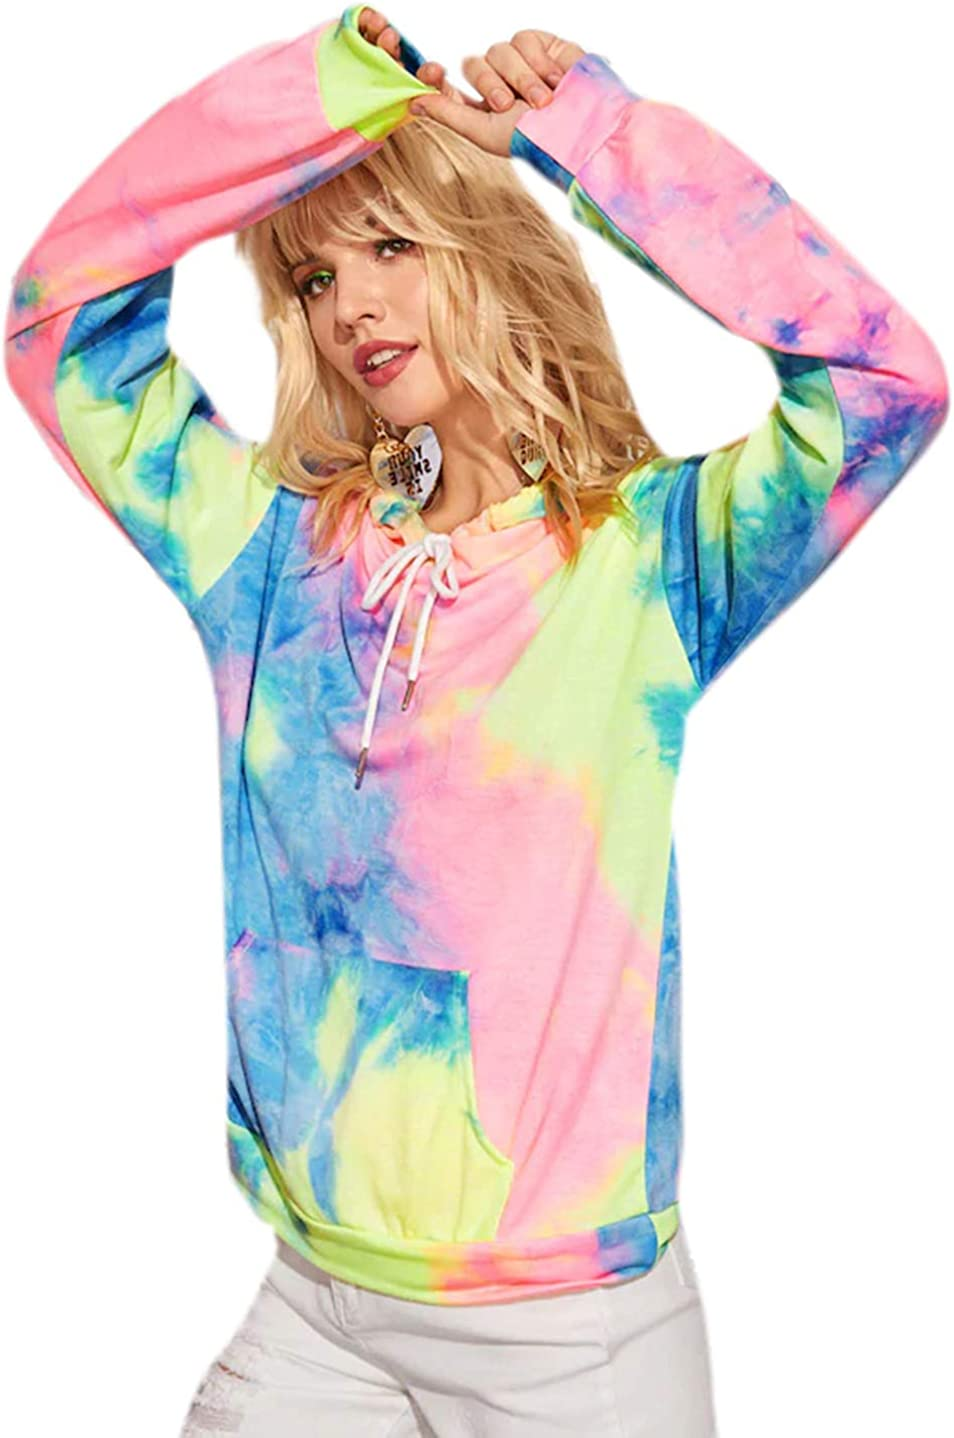 Romwe Women's Long Sleeve Tie Dye Drawstring Front Hoodies Kangaroo Pocket Sweatshirt